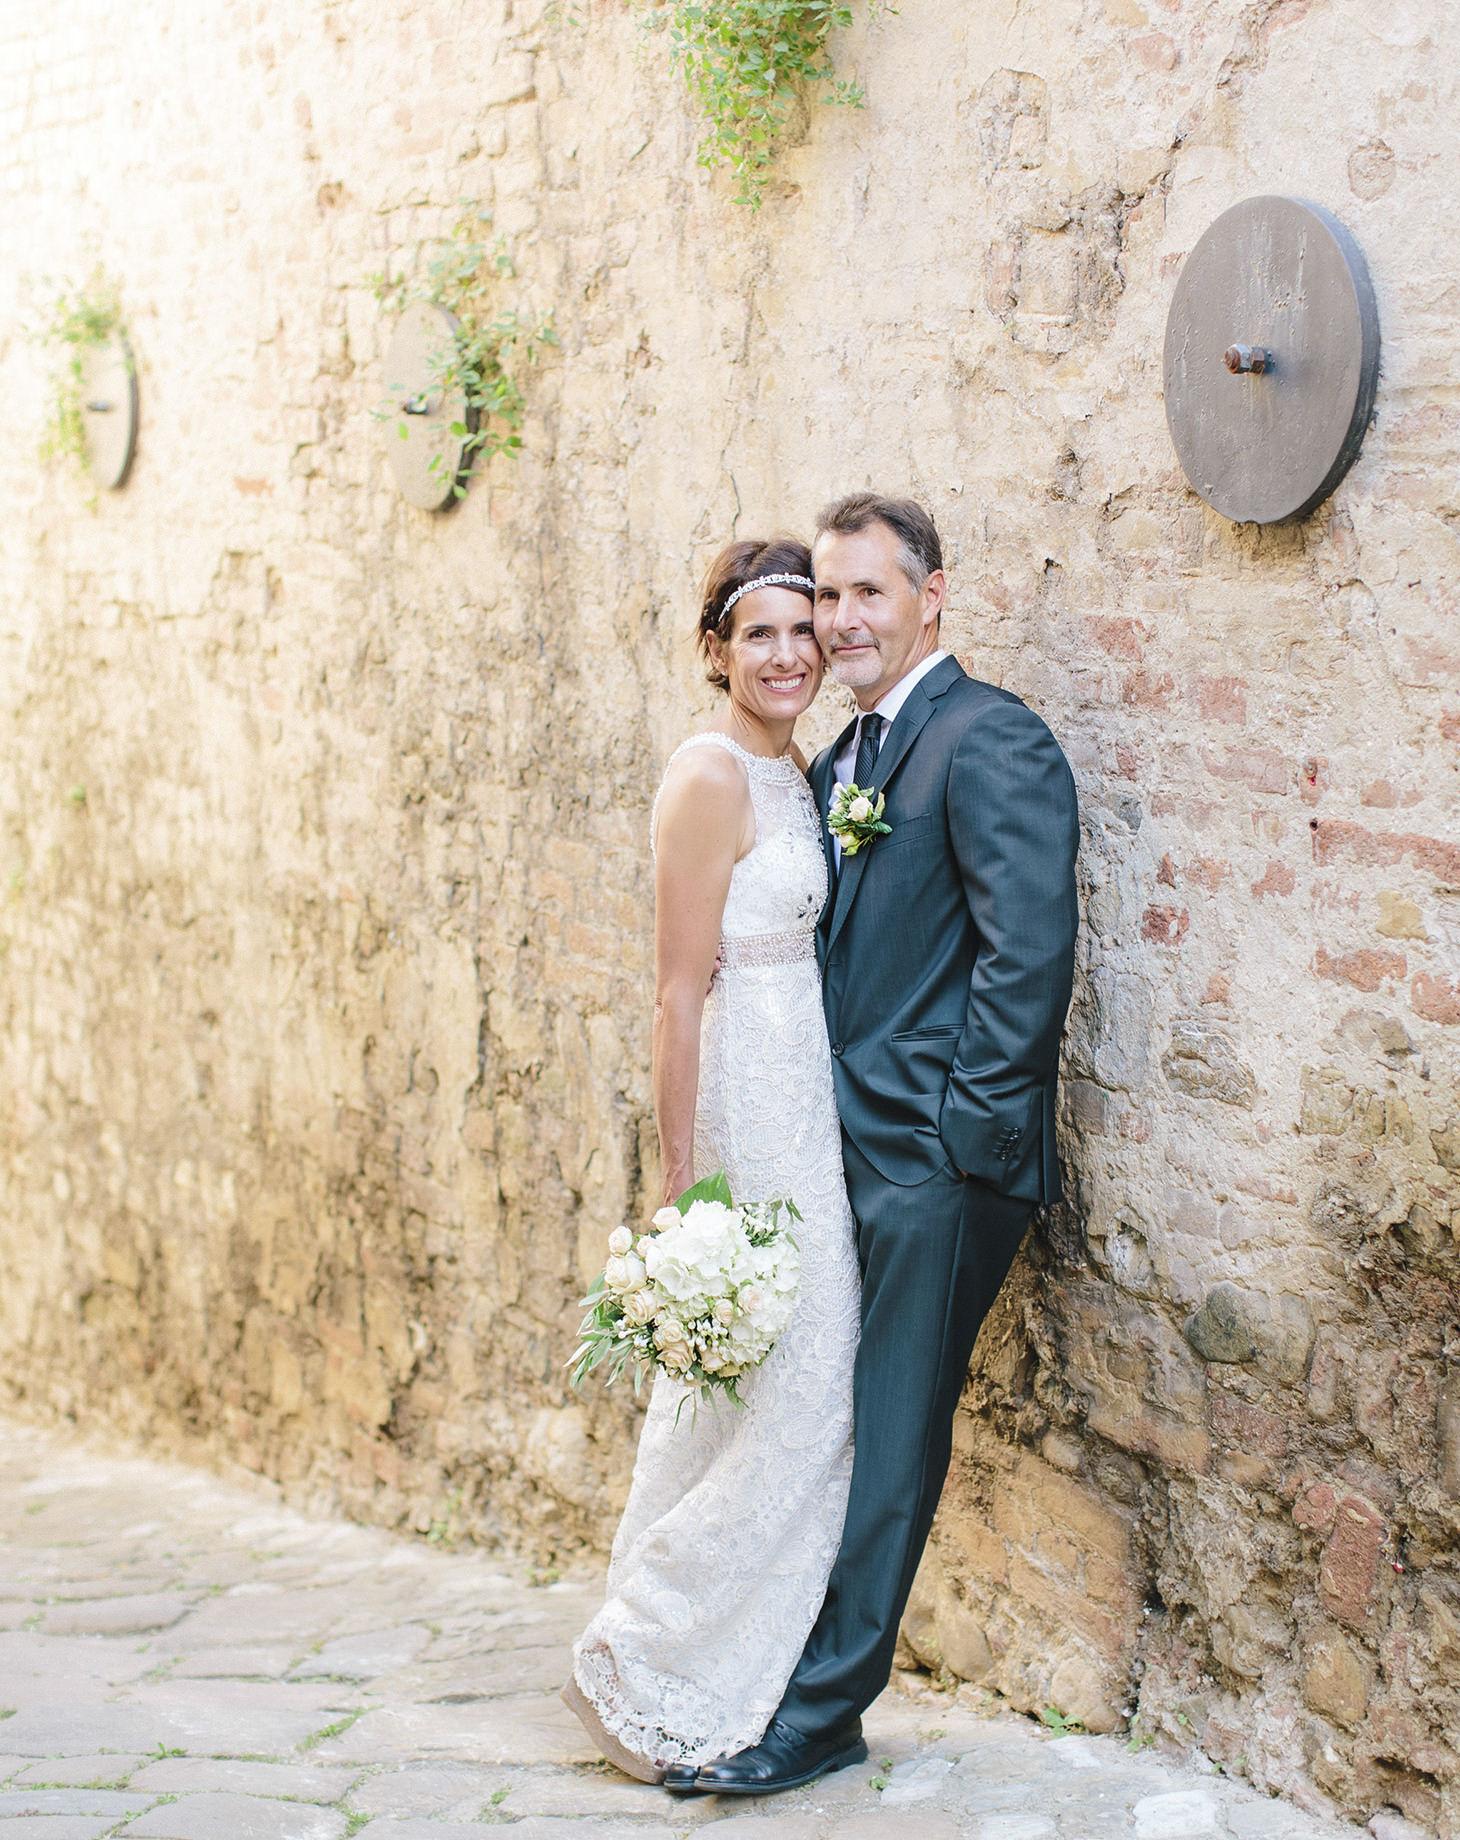 Denise & Ian | Certaldo